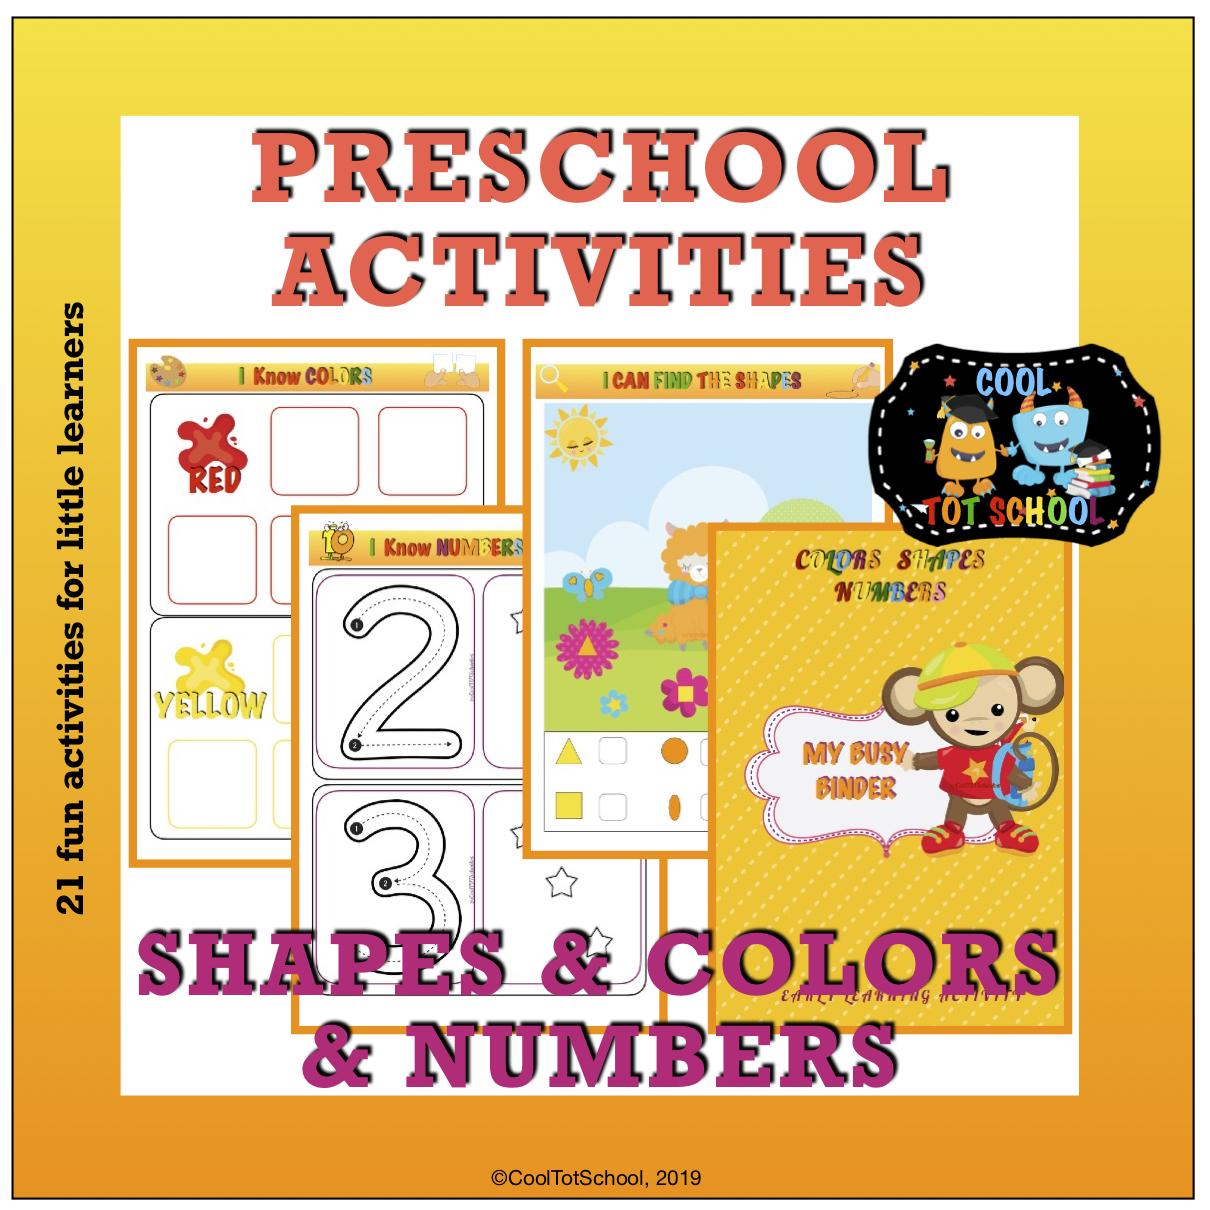 preschool-activities-shapes-colors-numbers-printable-games